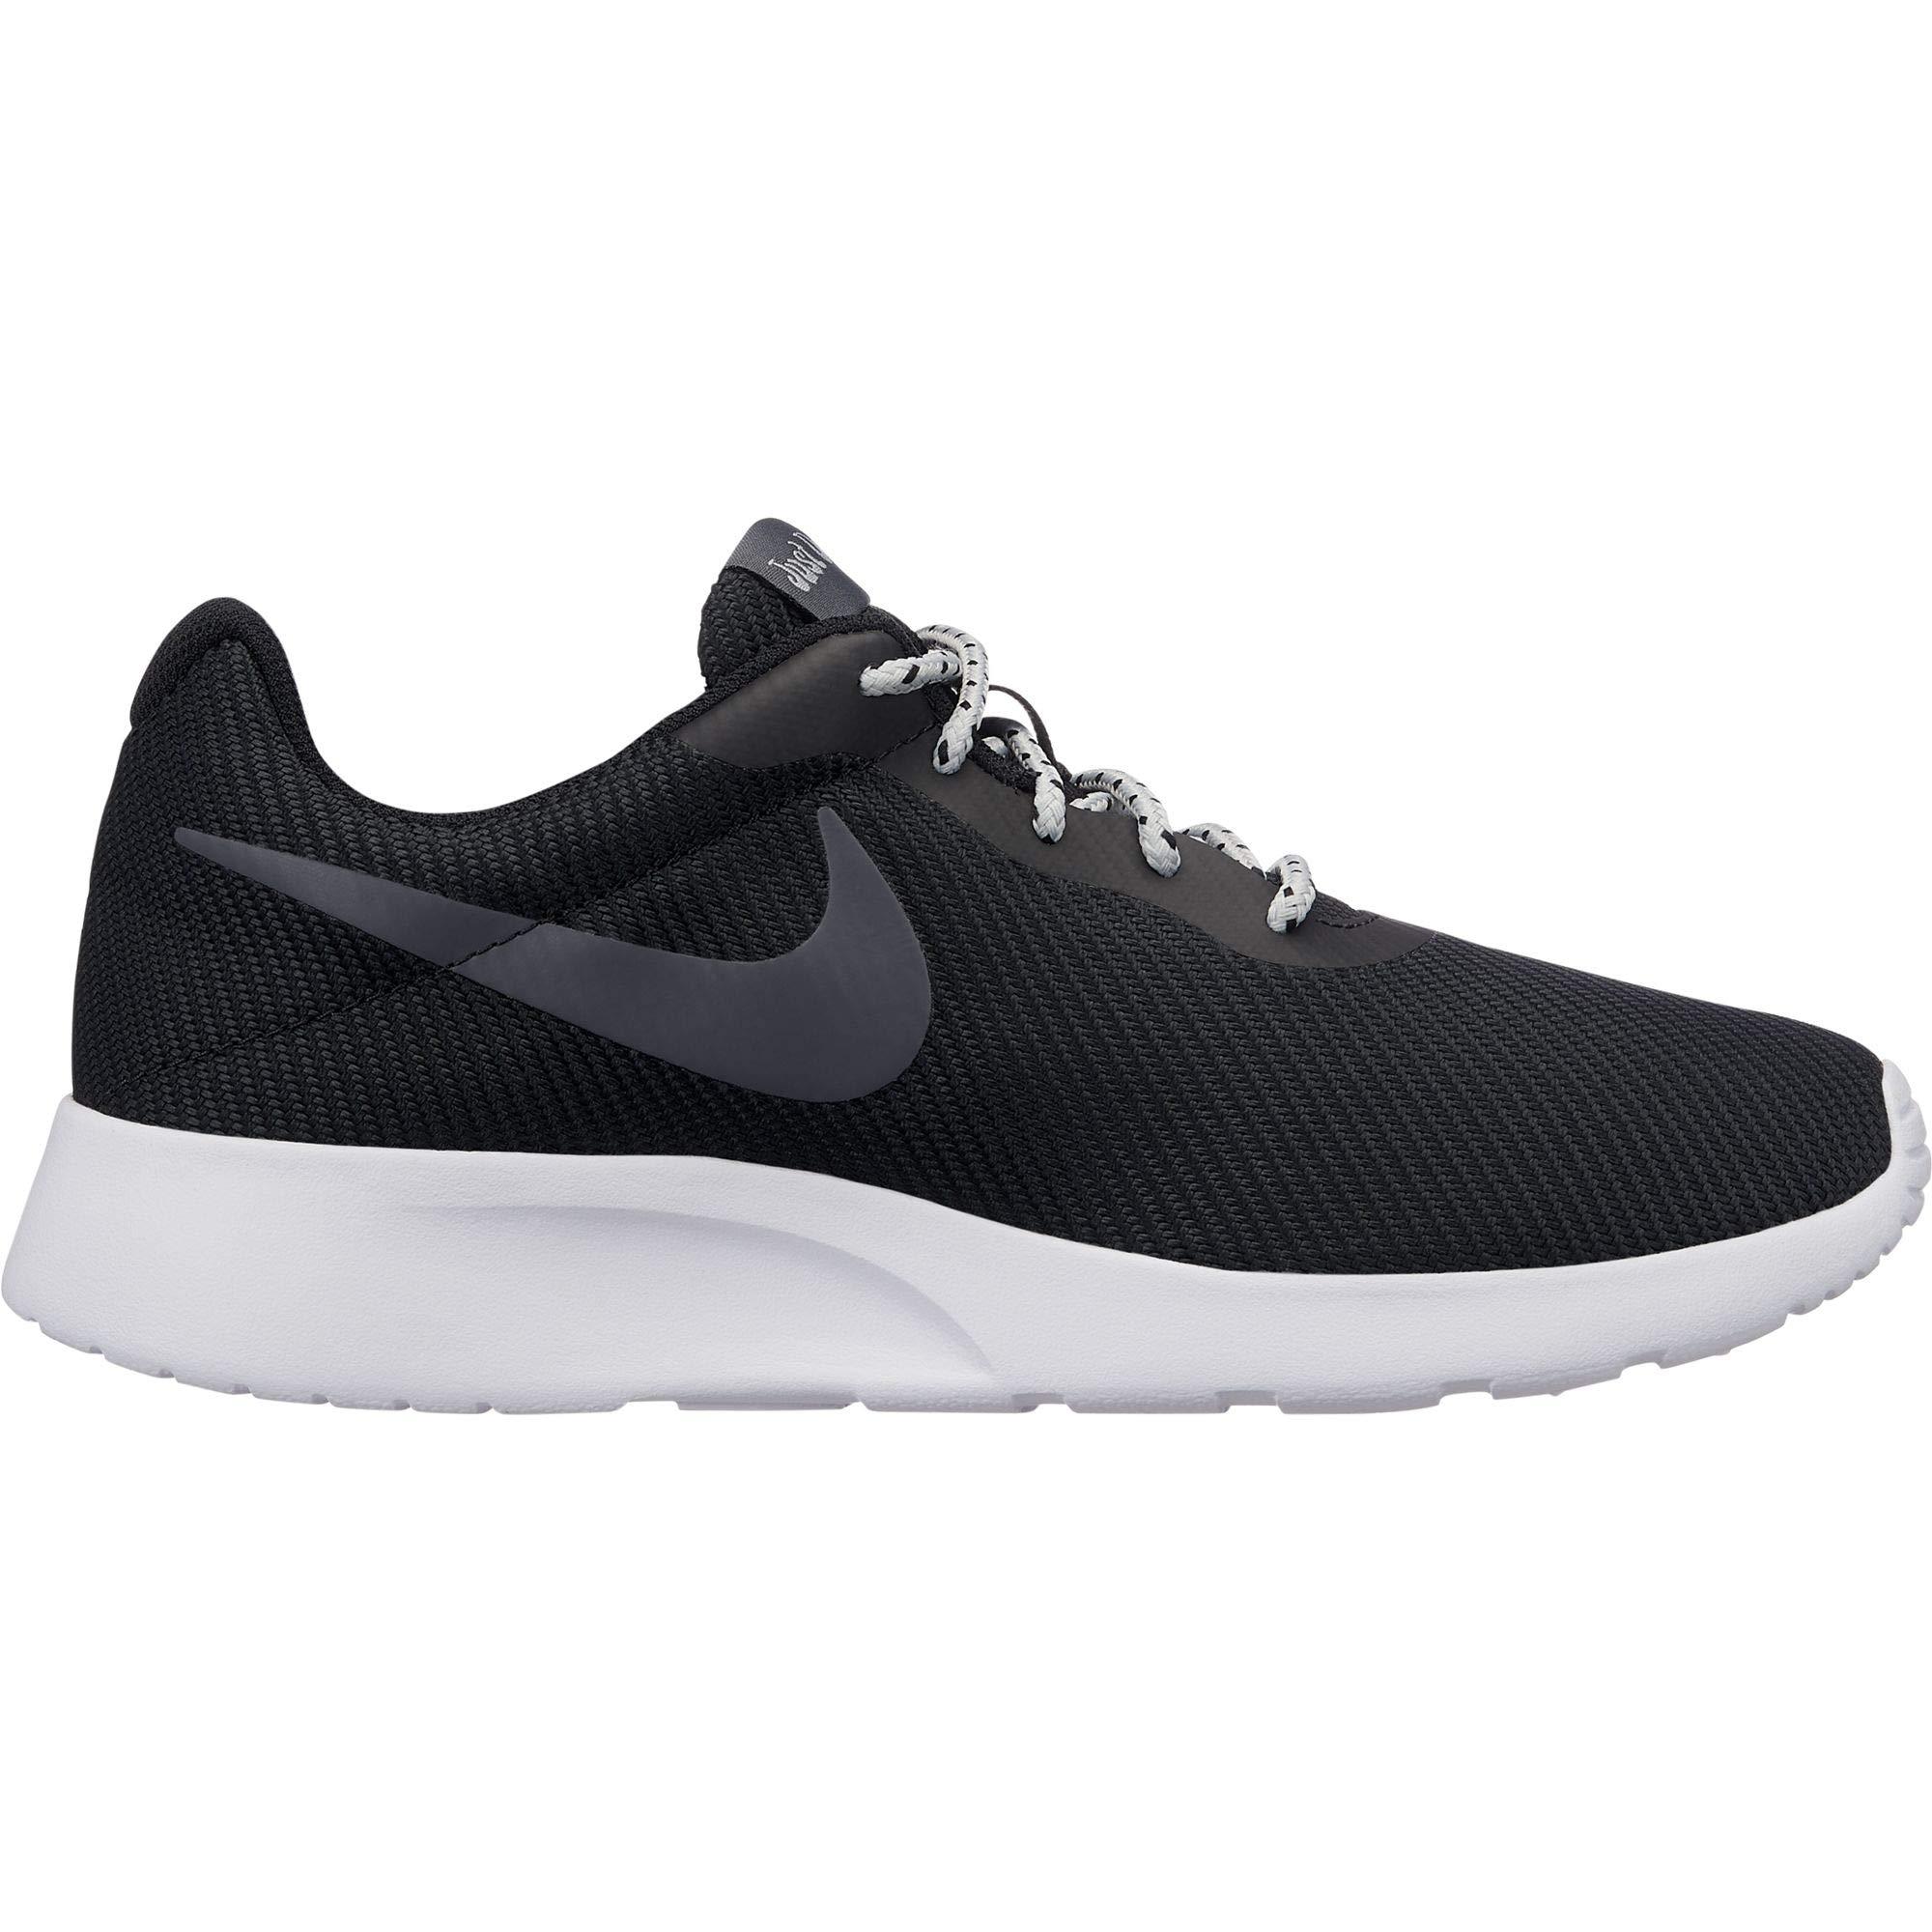 release date: 0d1d1 9e094 Galleon - Nike Women s Tanjun SE Running Shoes, Black Dark Grey-Wolf Grey,  11